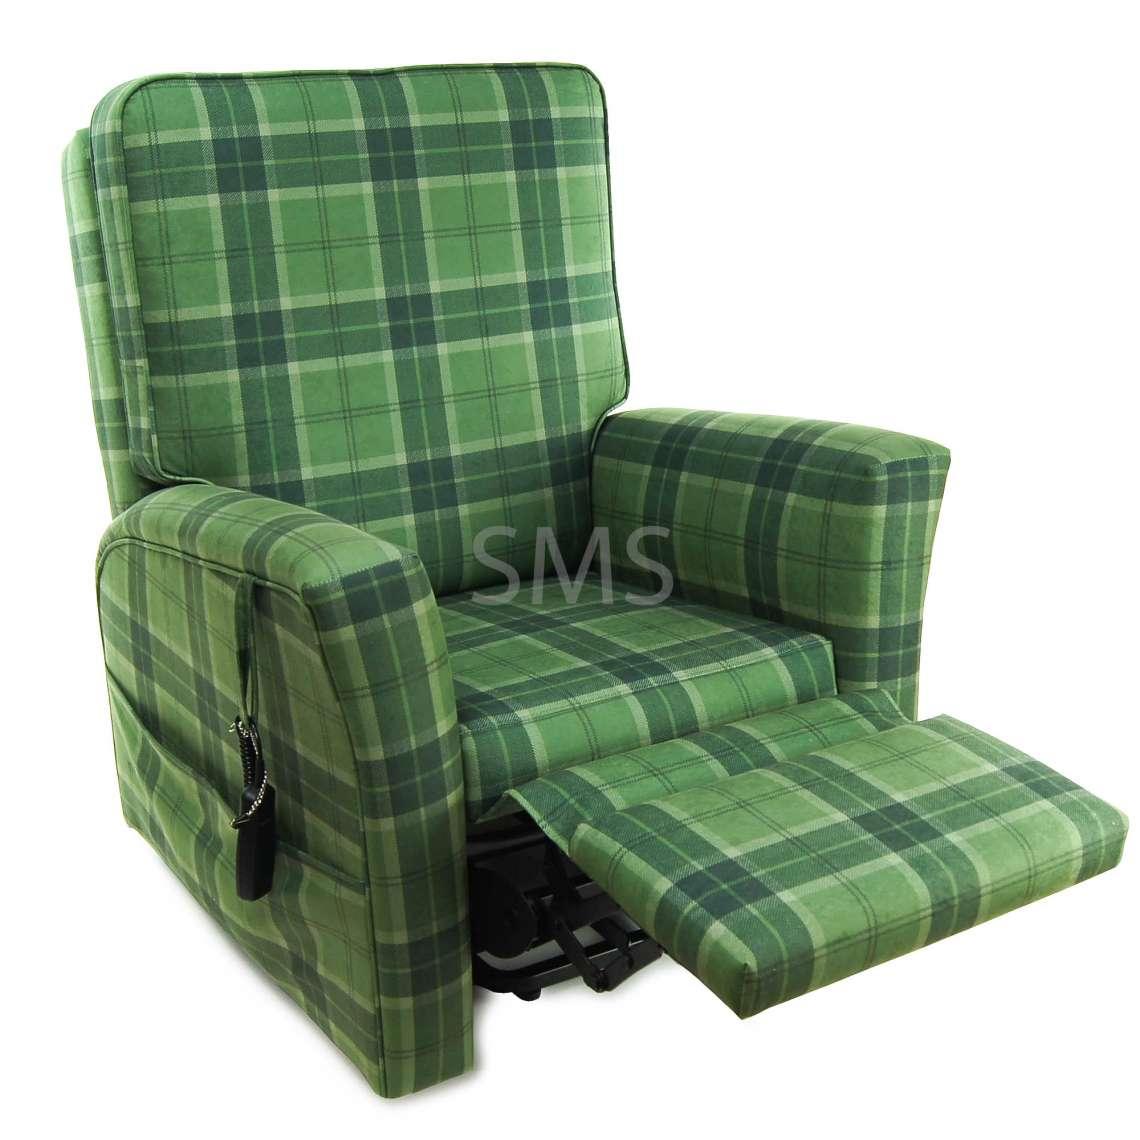 Sensational Riser Recliner Chairs Wallhugger Basingstoke Info Prices Creativecarmelina Interior Chair Design Creativecarmelinacom